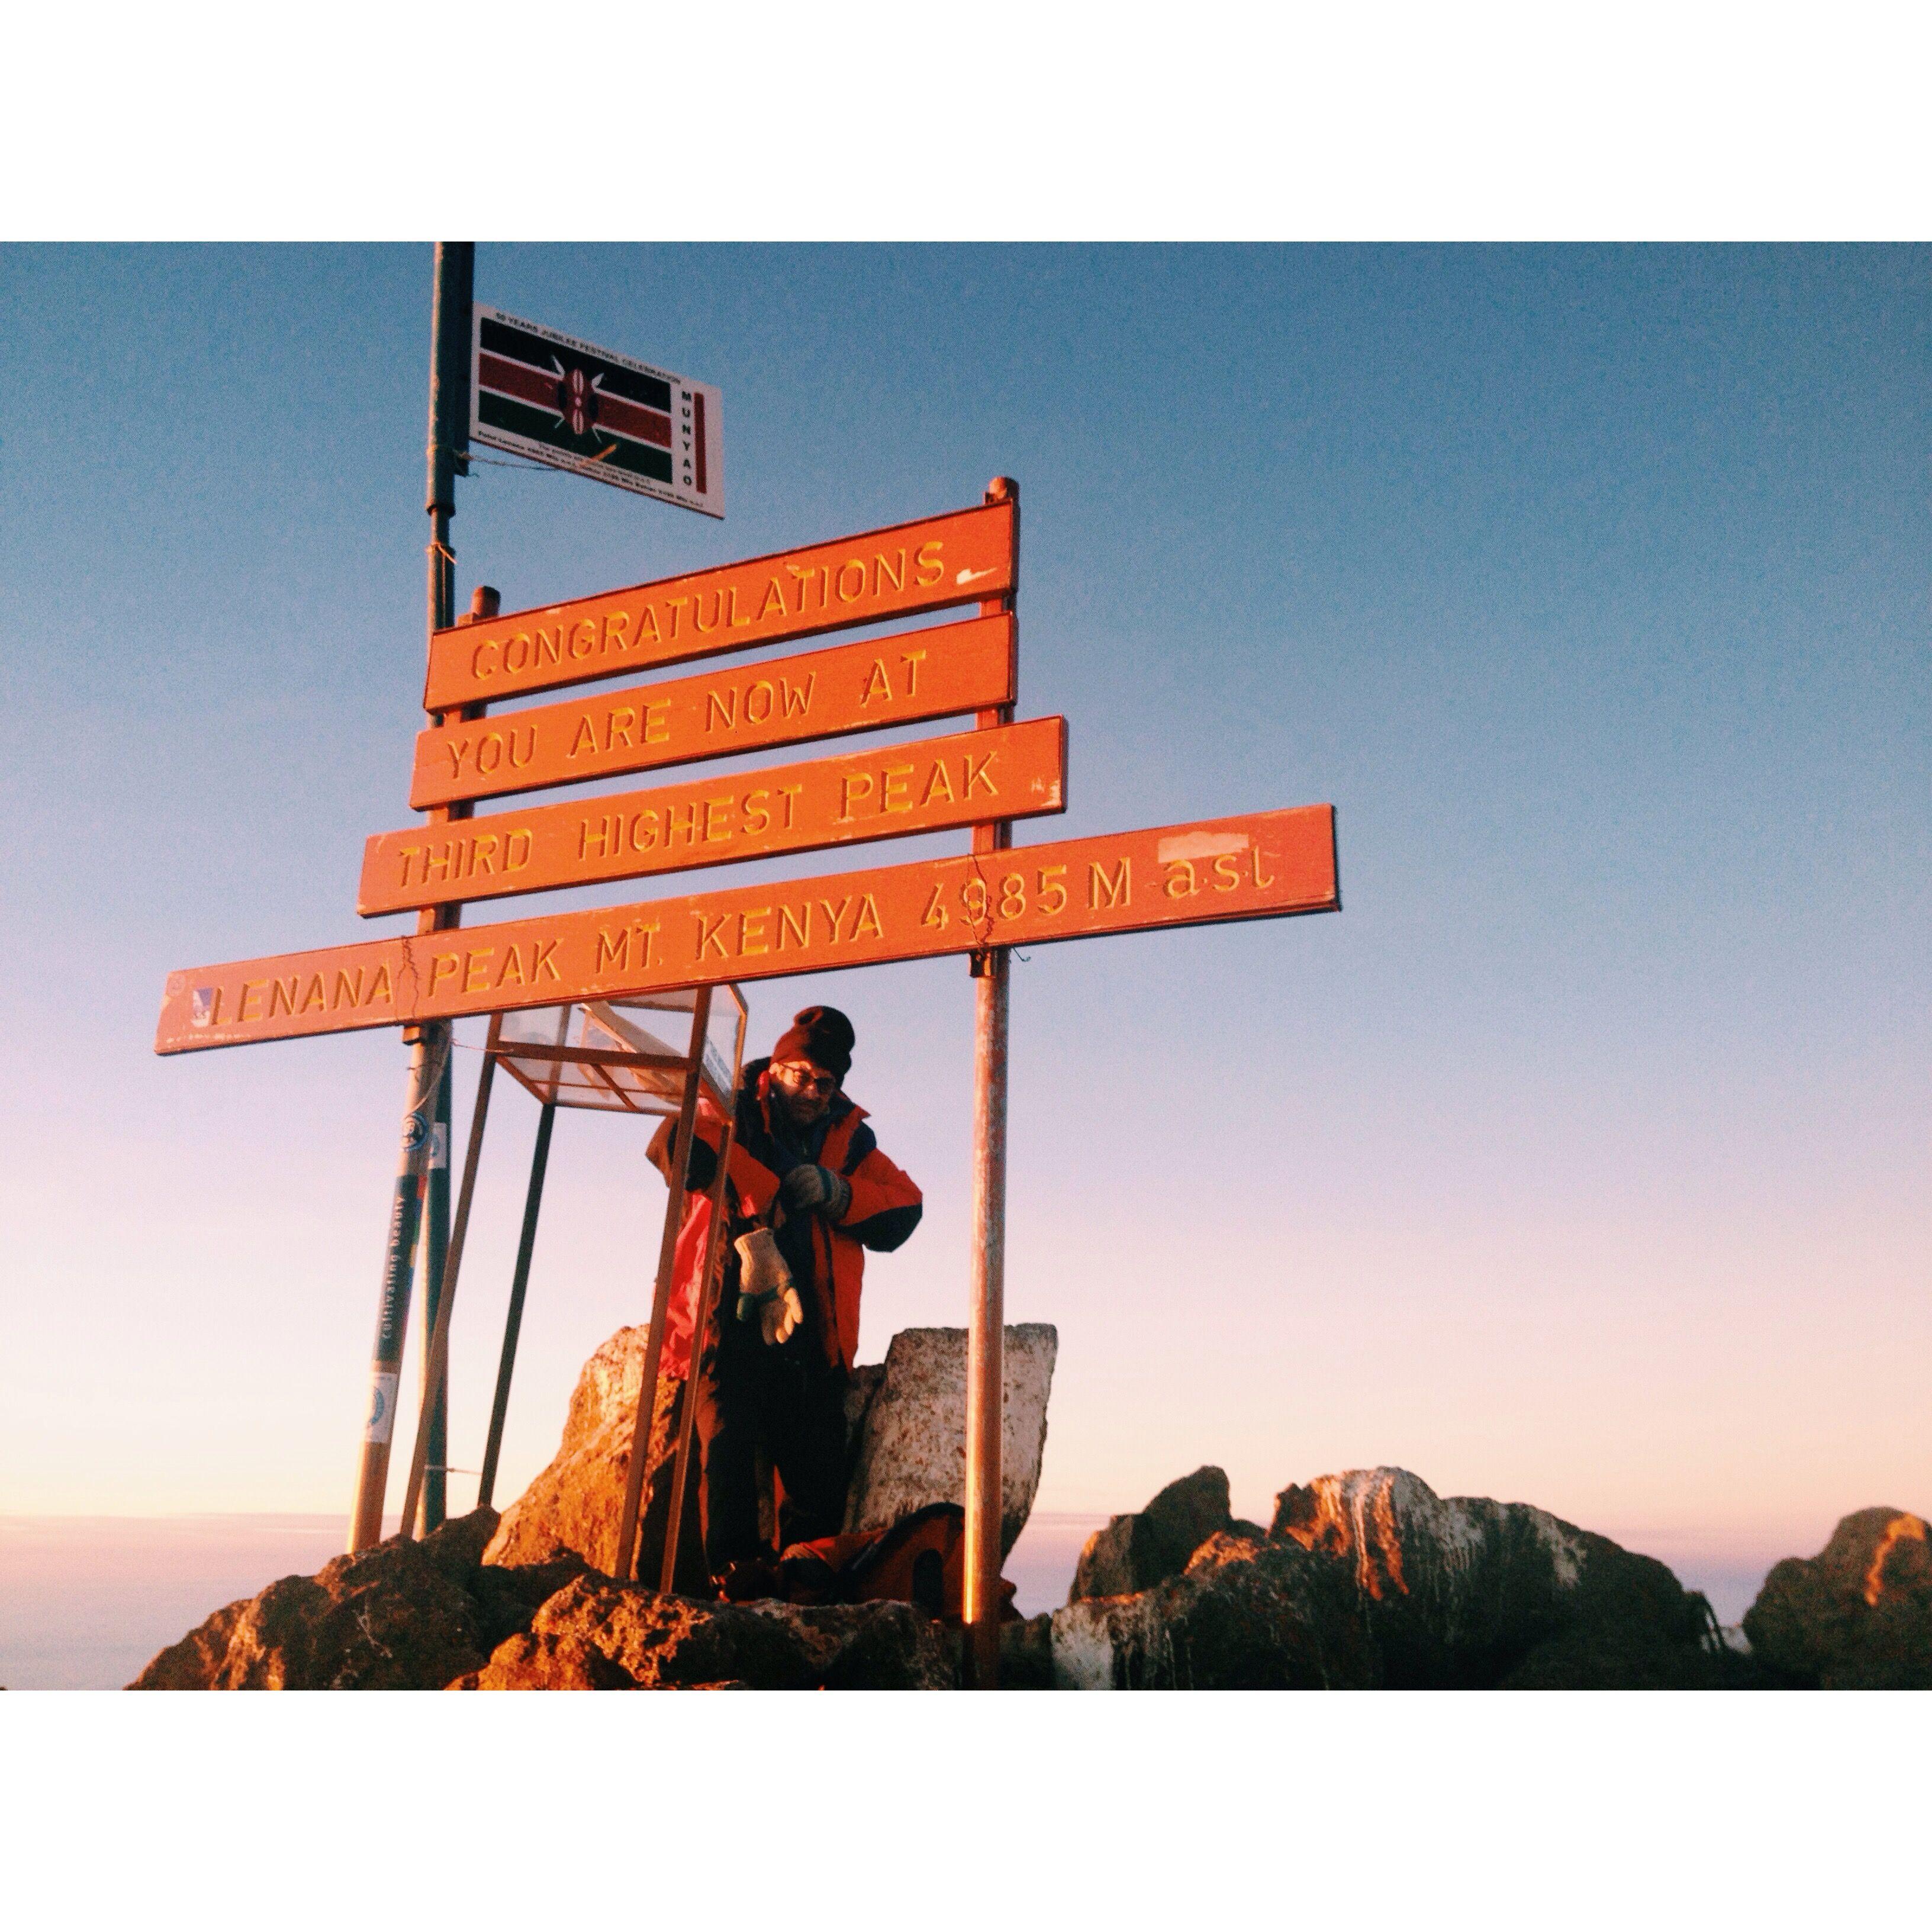 Point Lenana 3rd summit 4985m Mount kenya, Highway